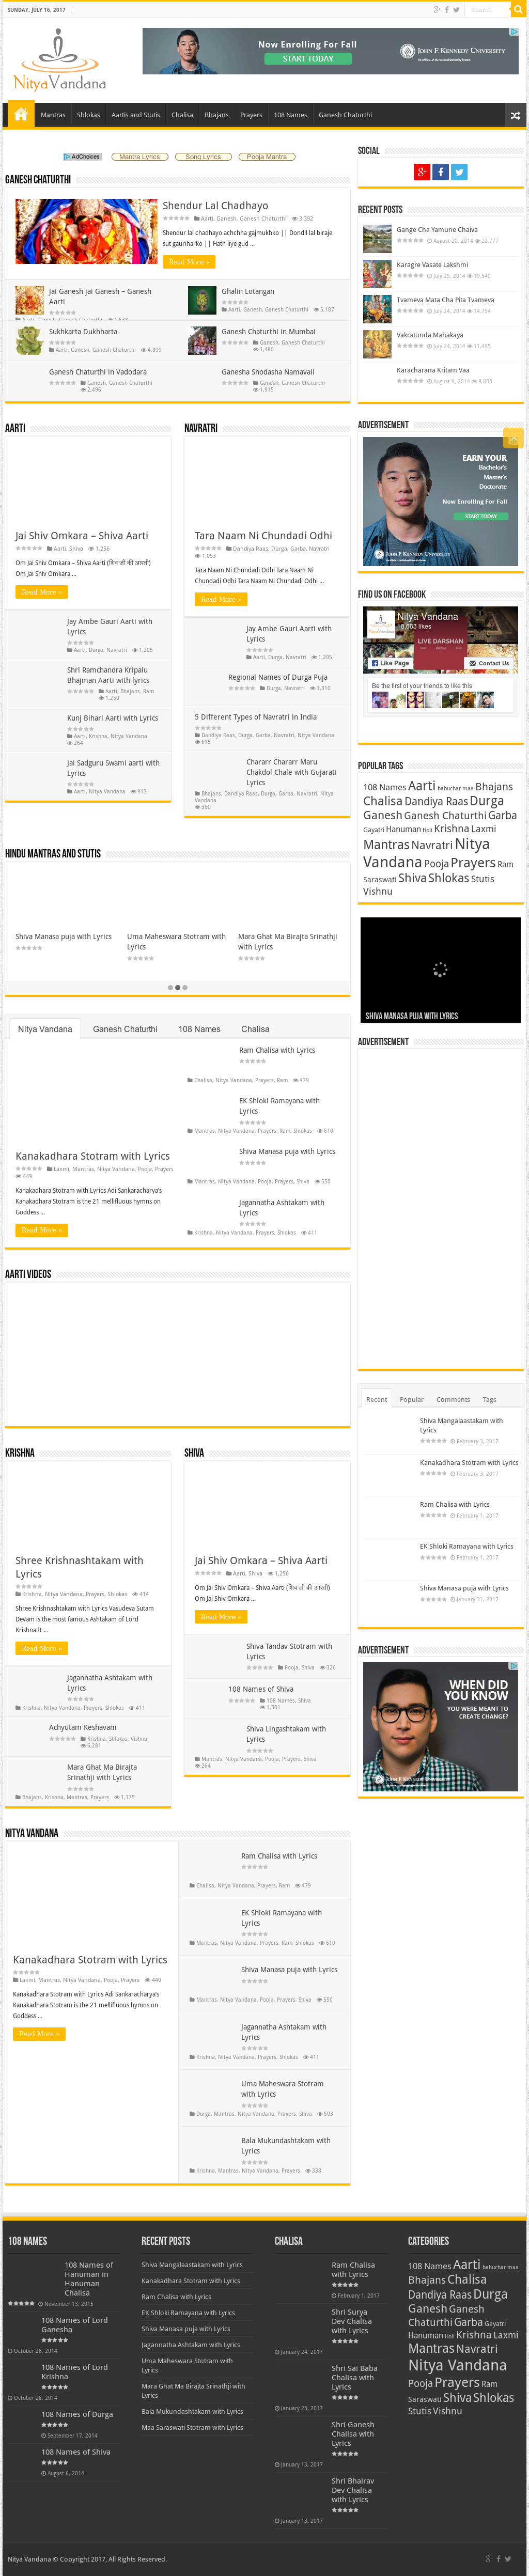 Nitya Vandana Competitors, Revenue and Employees - Owler Company Profile